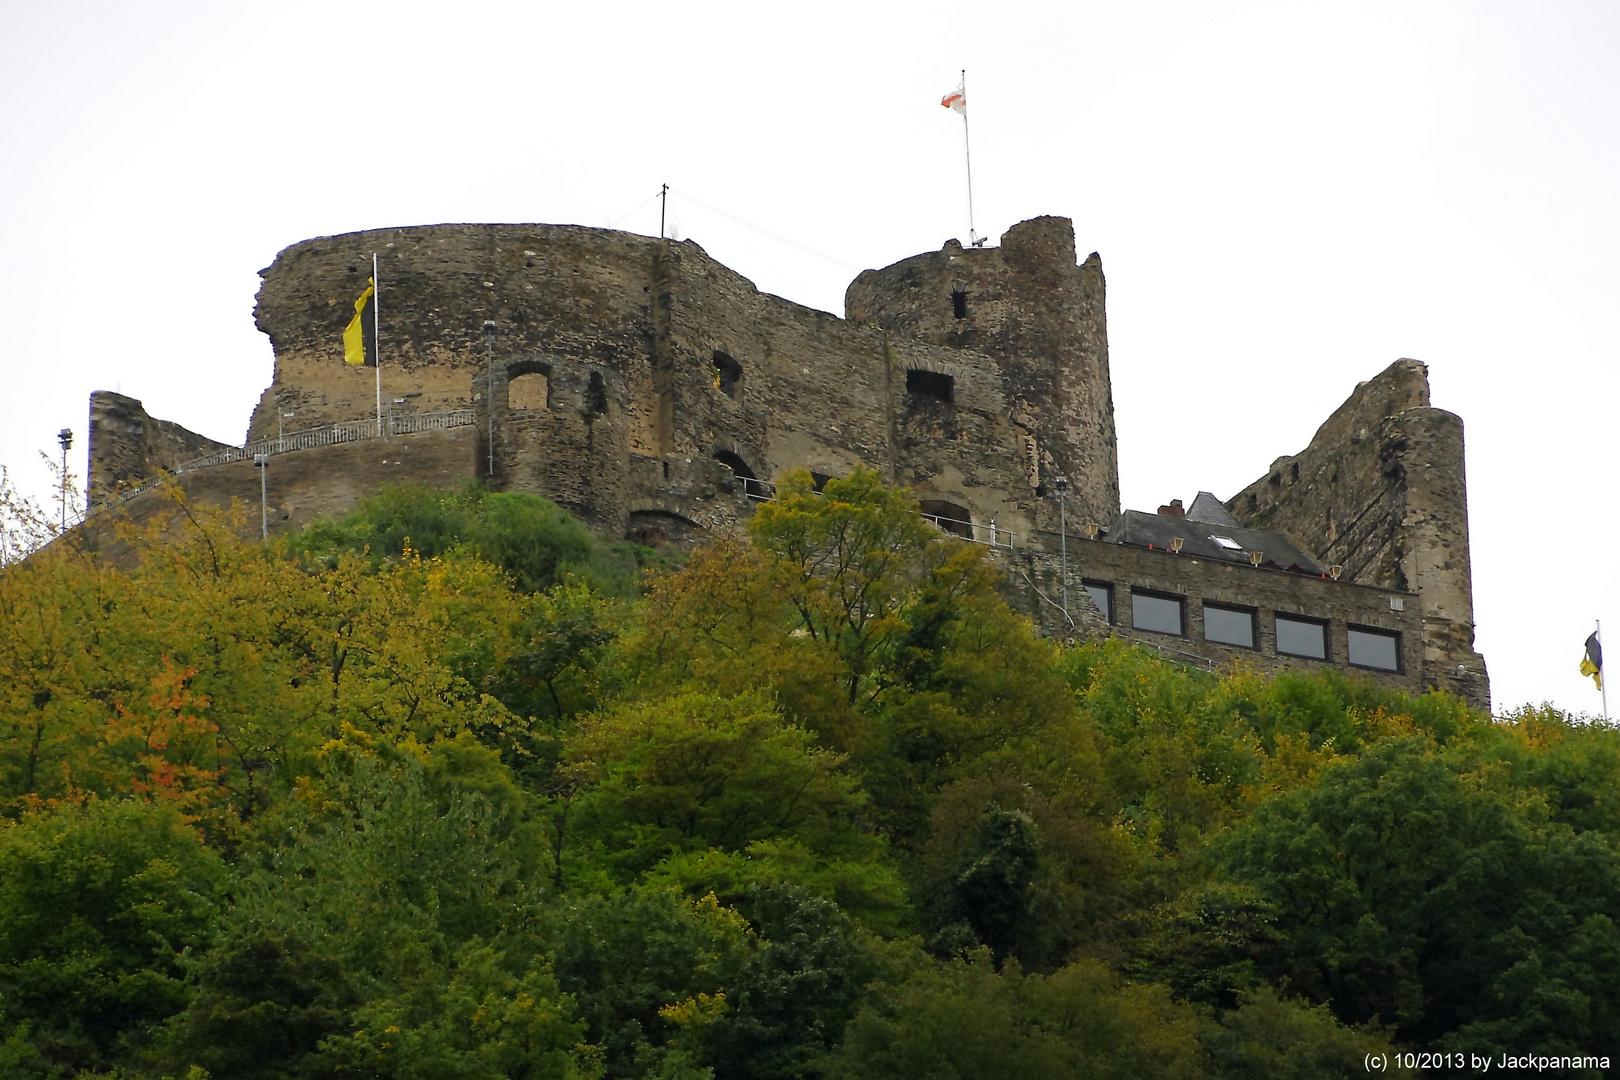 Burg Landshut in Bernkaste Kues